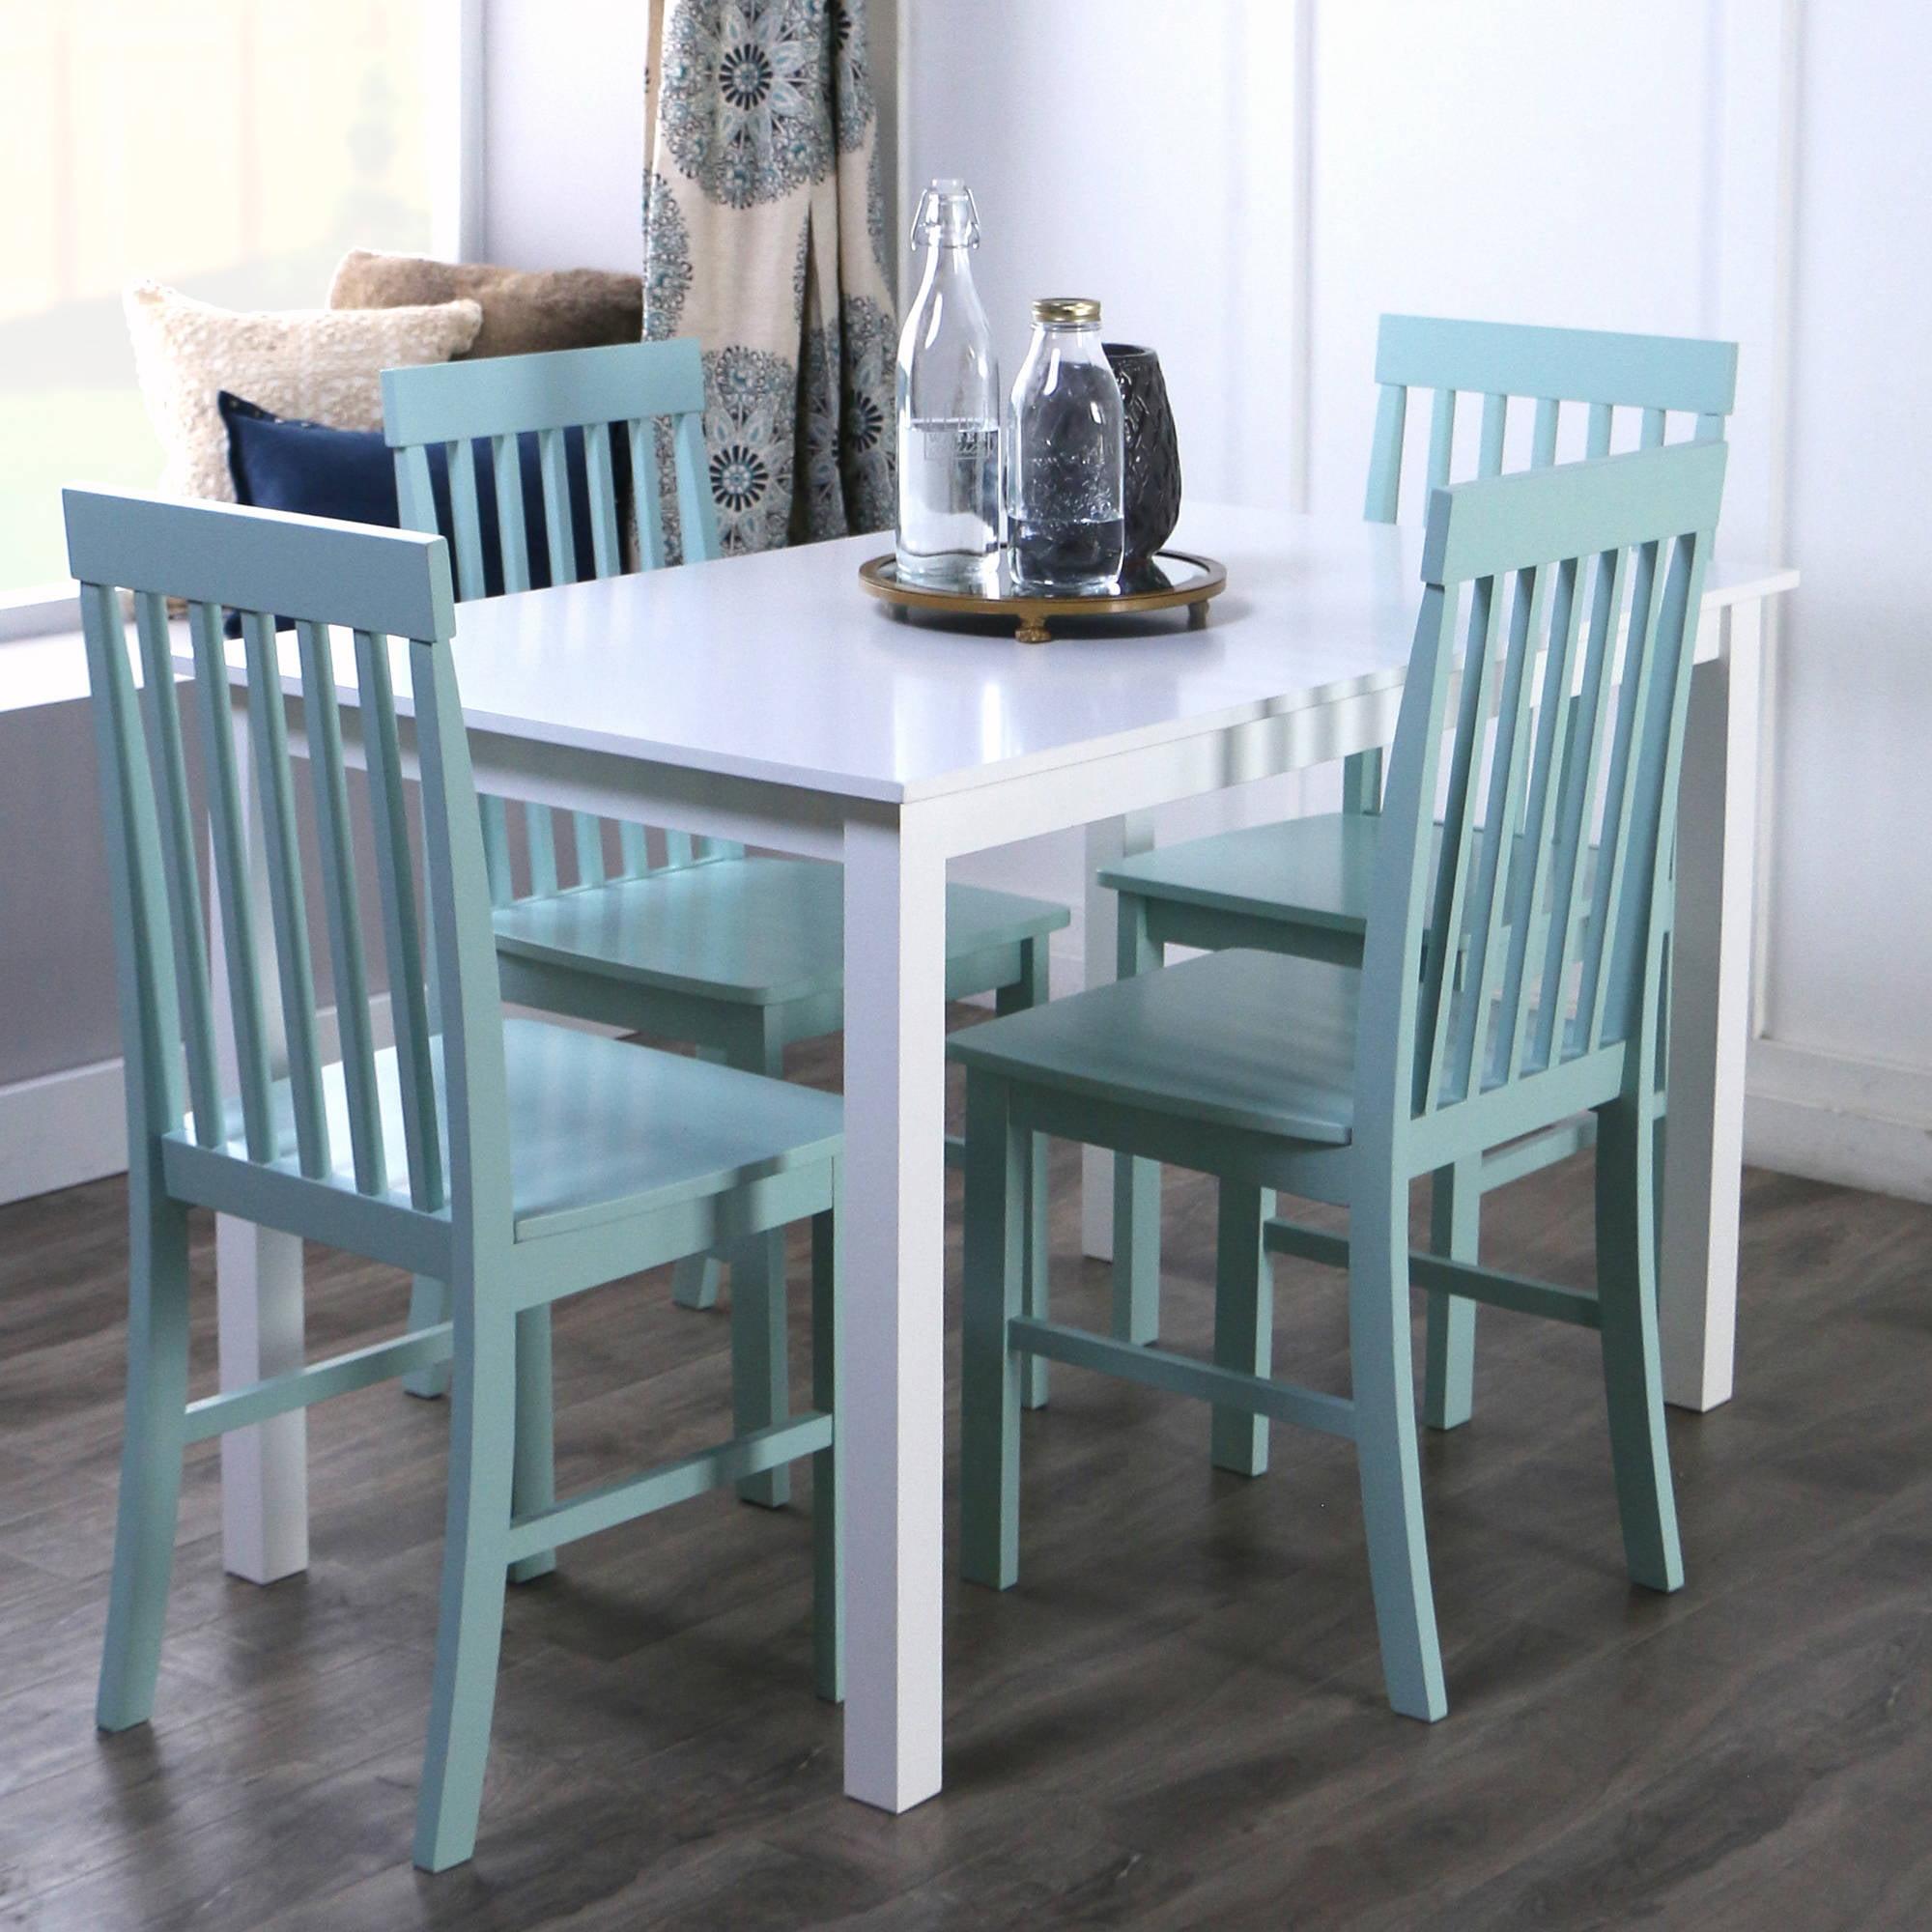 Walker Edison 5-Piece Wood Dining Set - Walmart.com